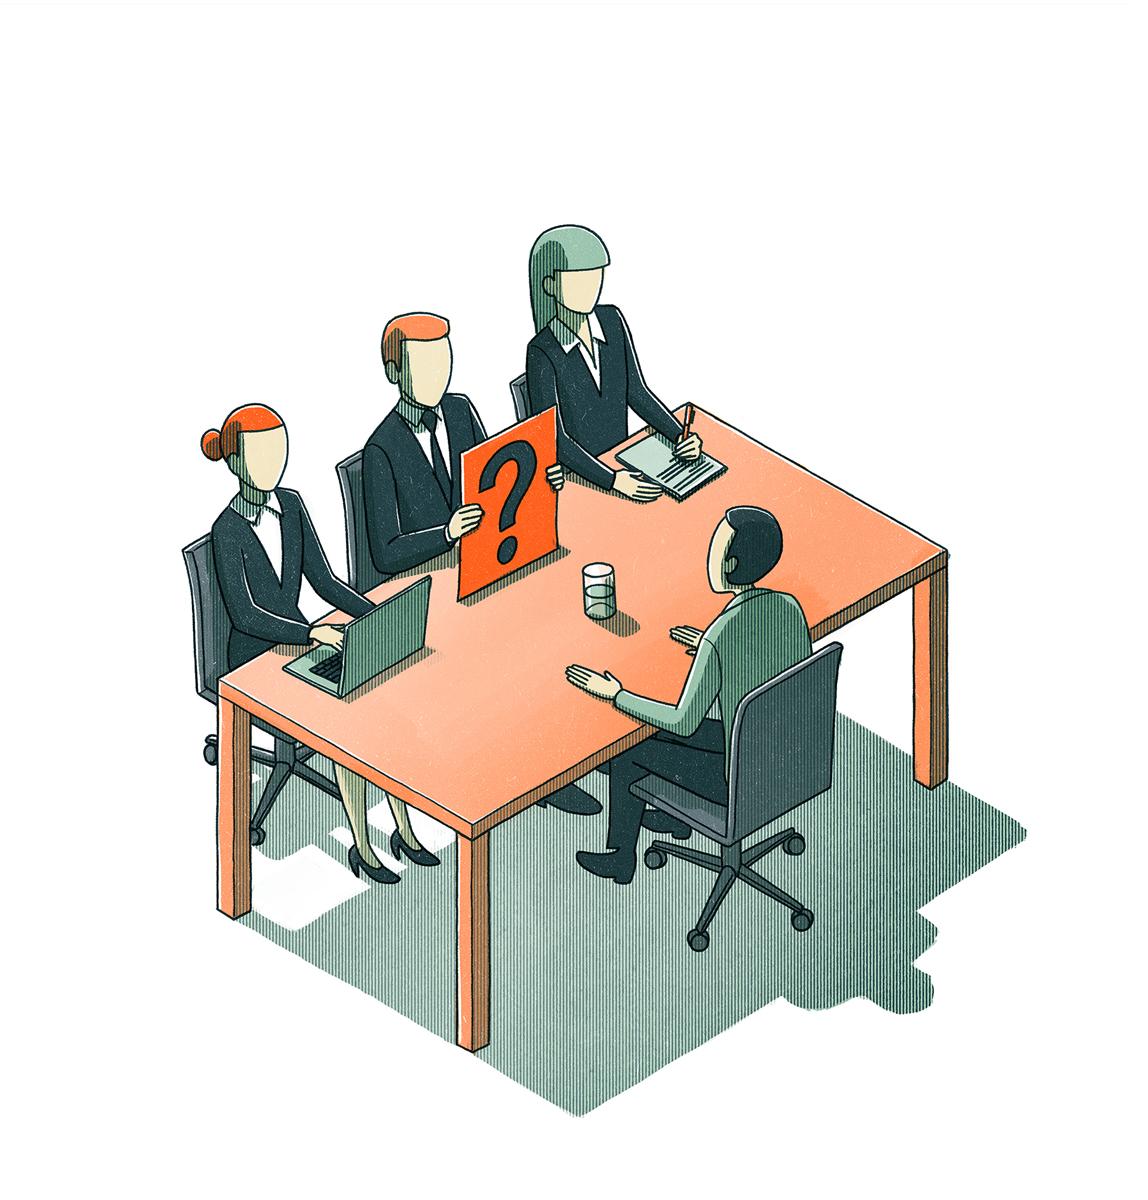 danae diaz, illustration, job interview